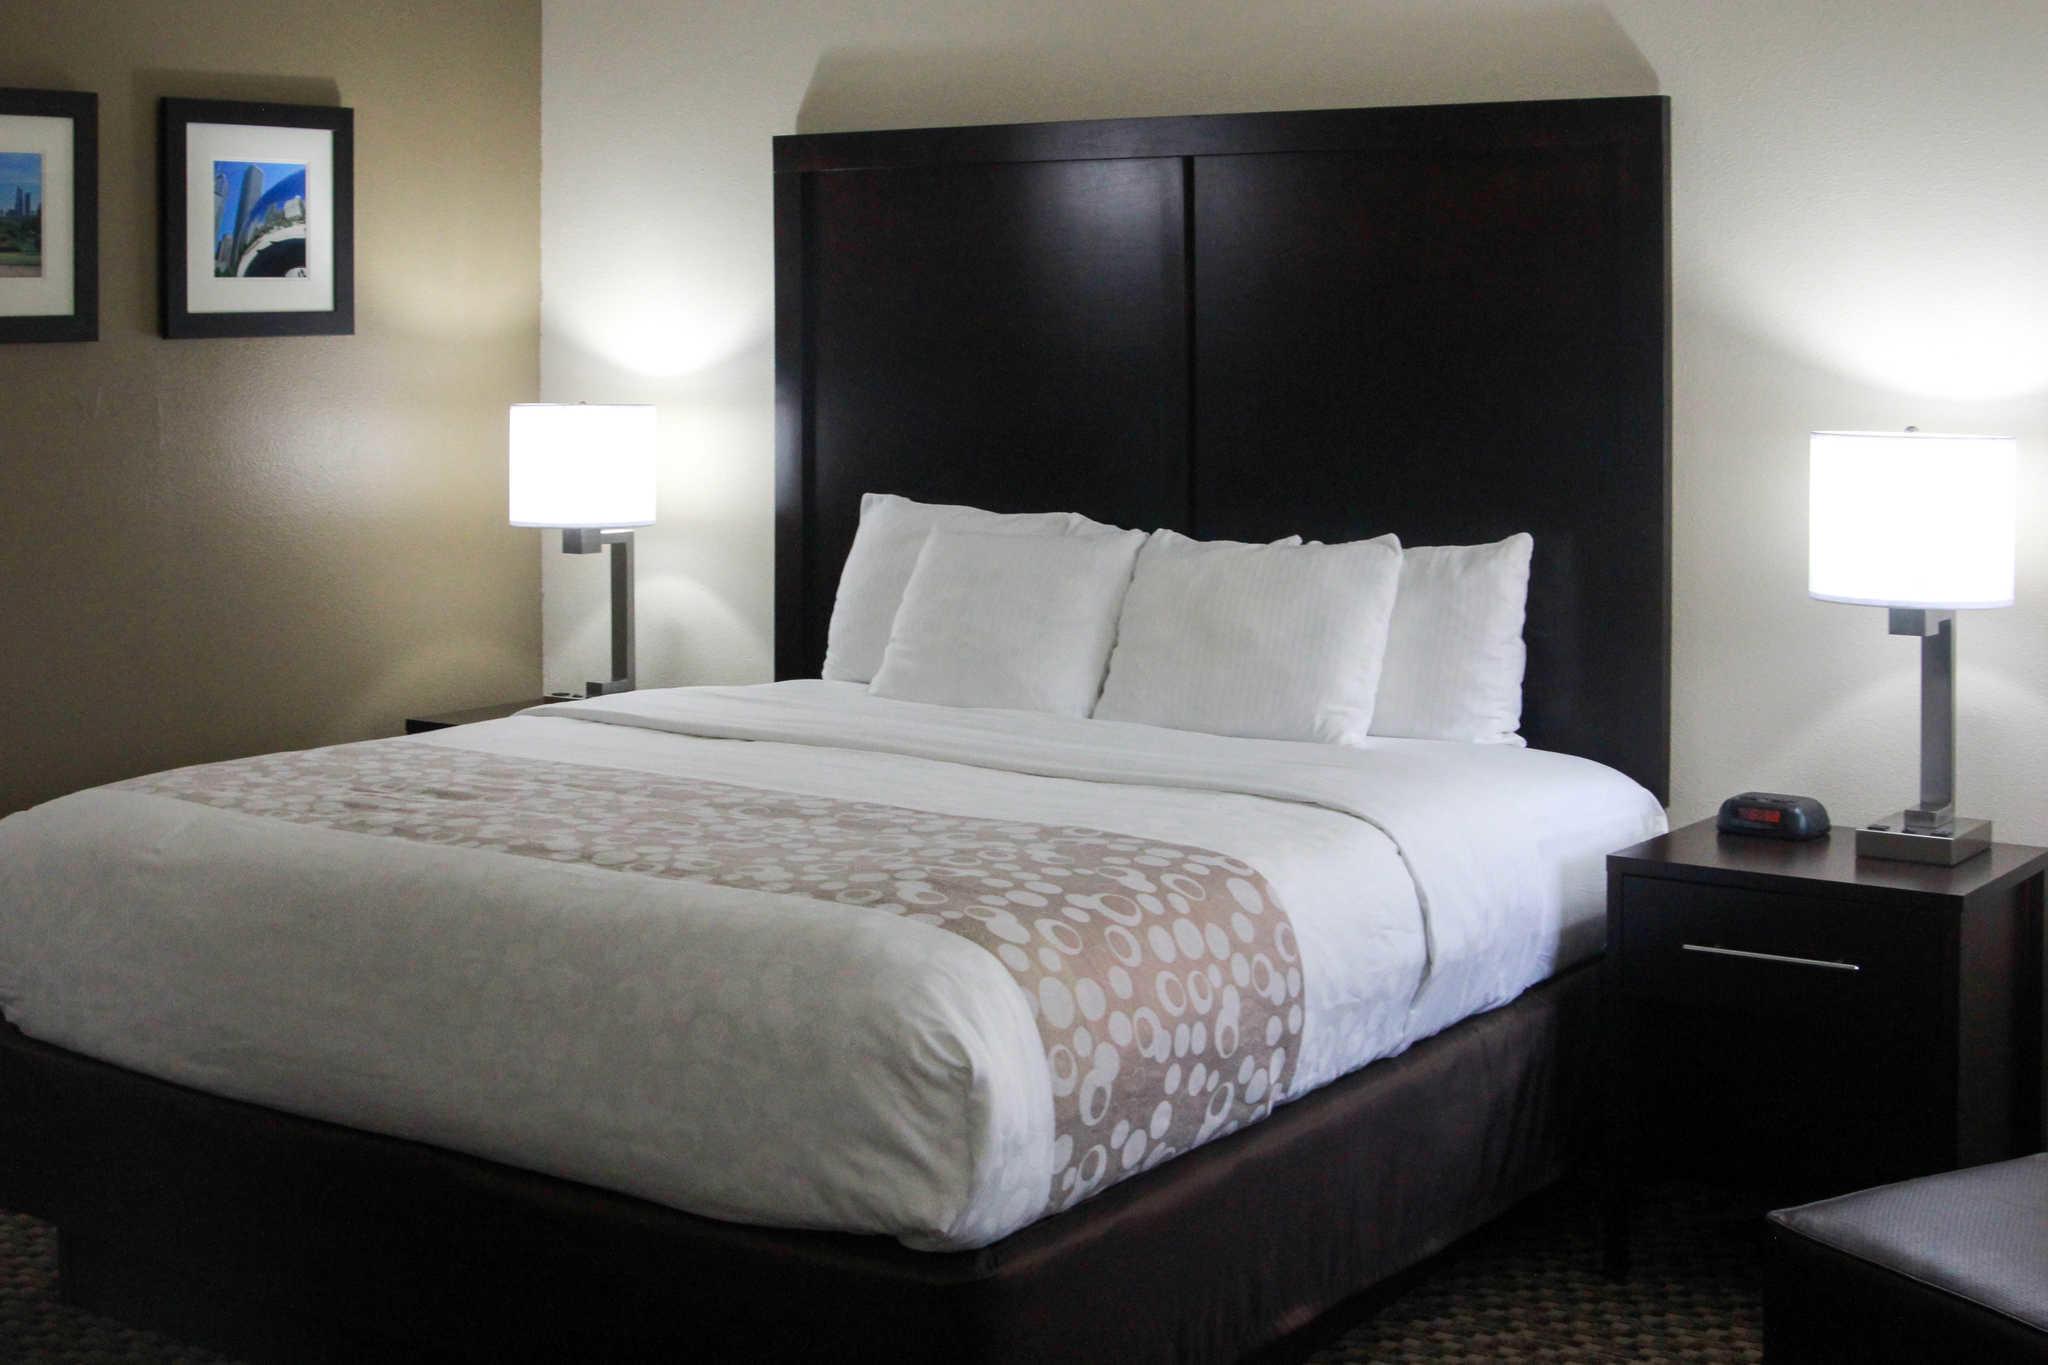 Comfort Inn Matteson - Chicago image 4